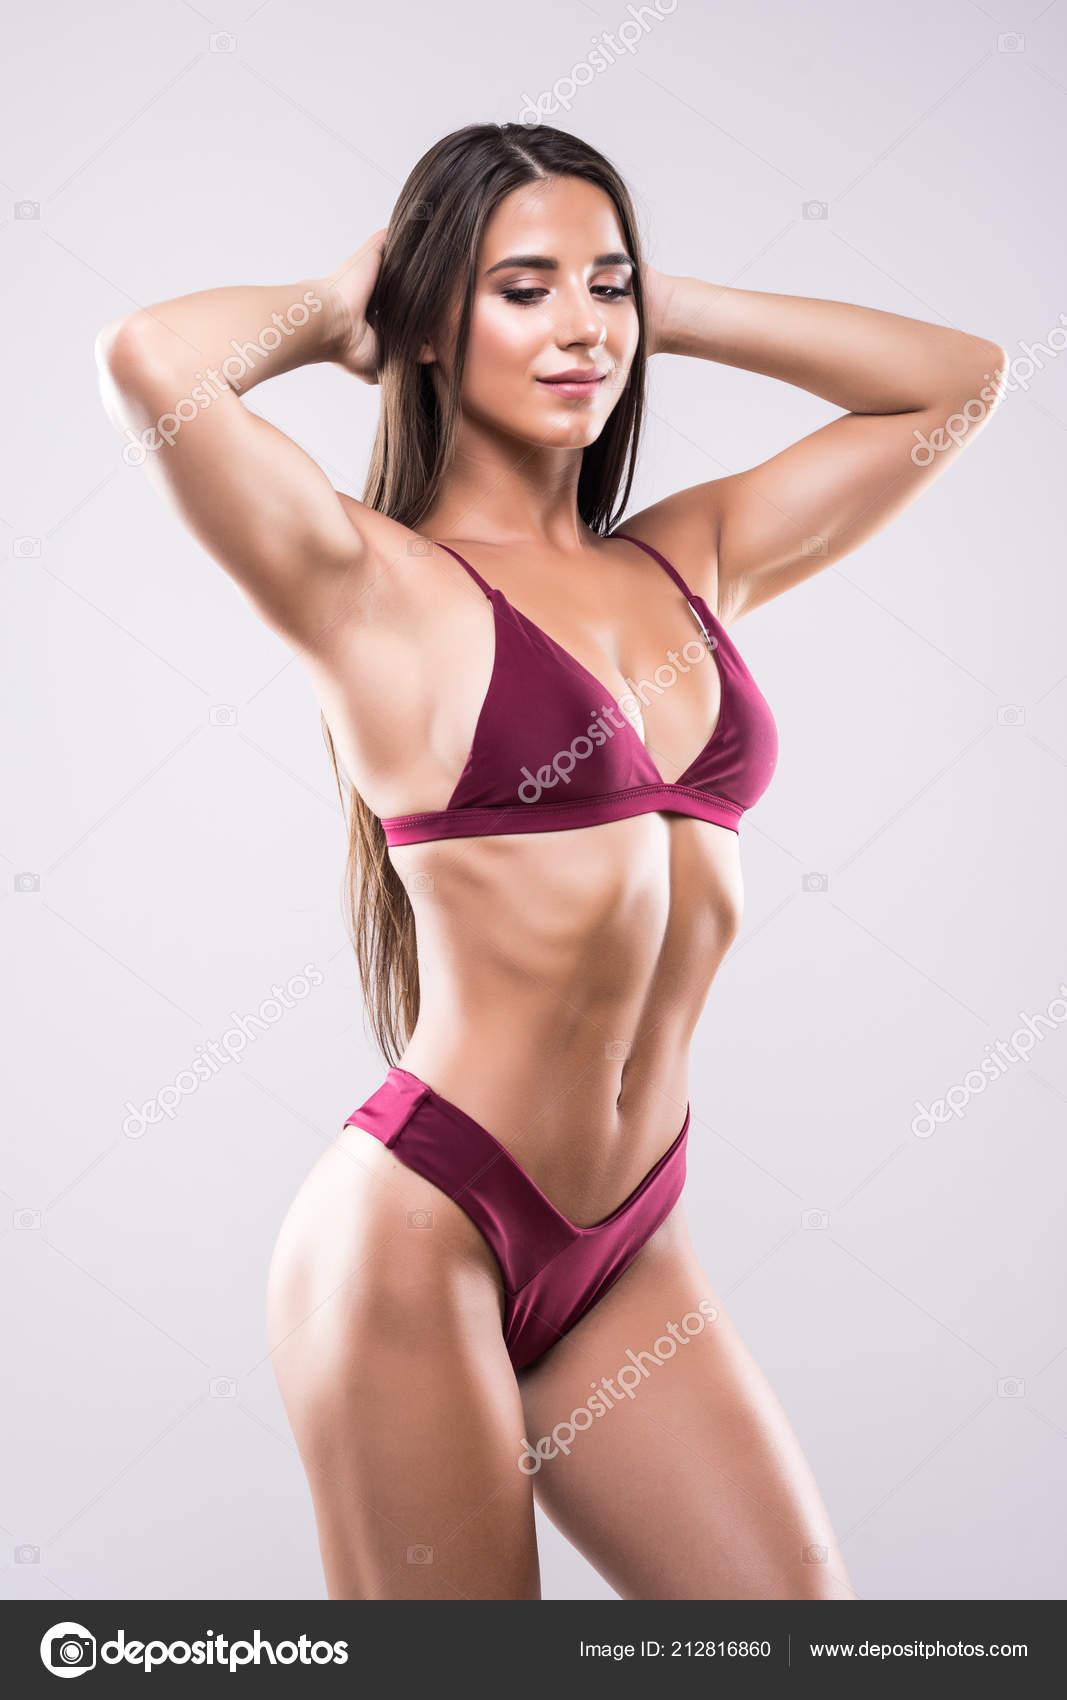 bdf16c46911ad Slim body of woman in bikini. Girl with healthy sporty figure isolated on  white background — Photo by dan.grytsku.gmail.com| ...